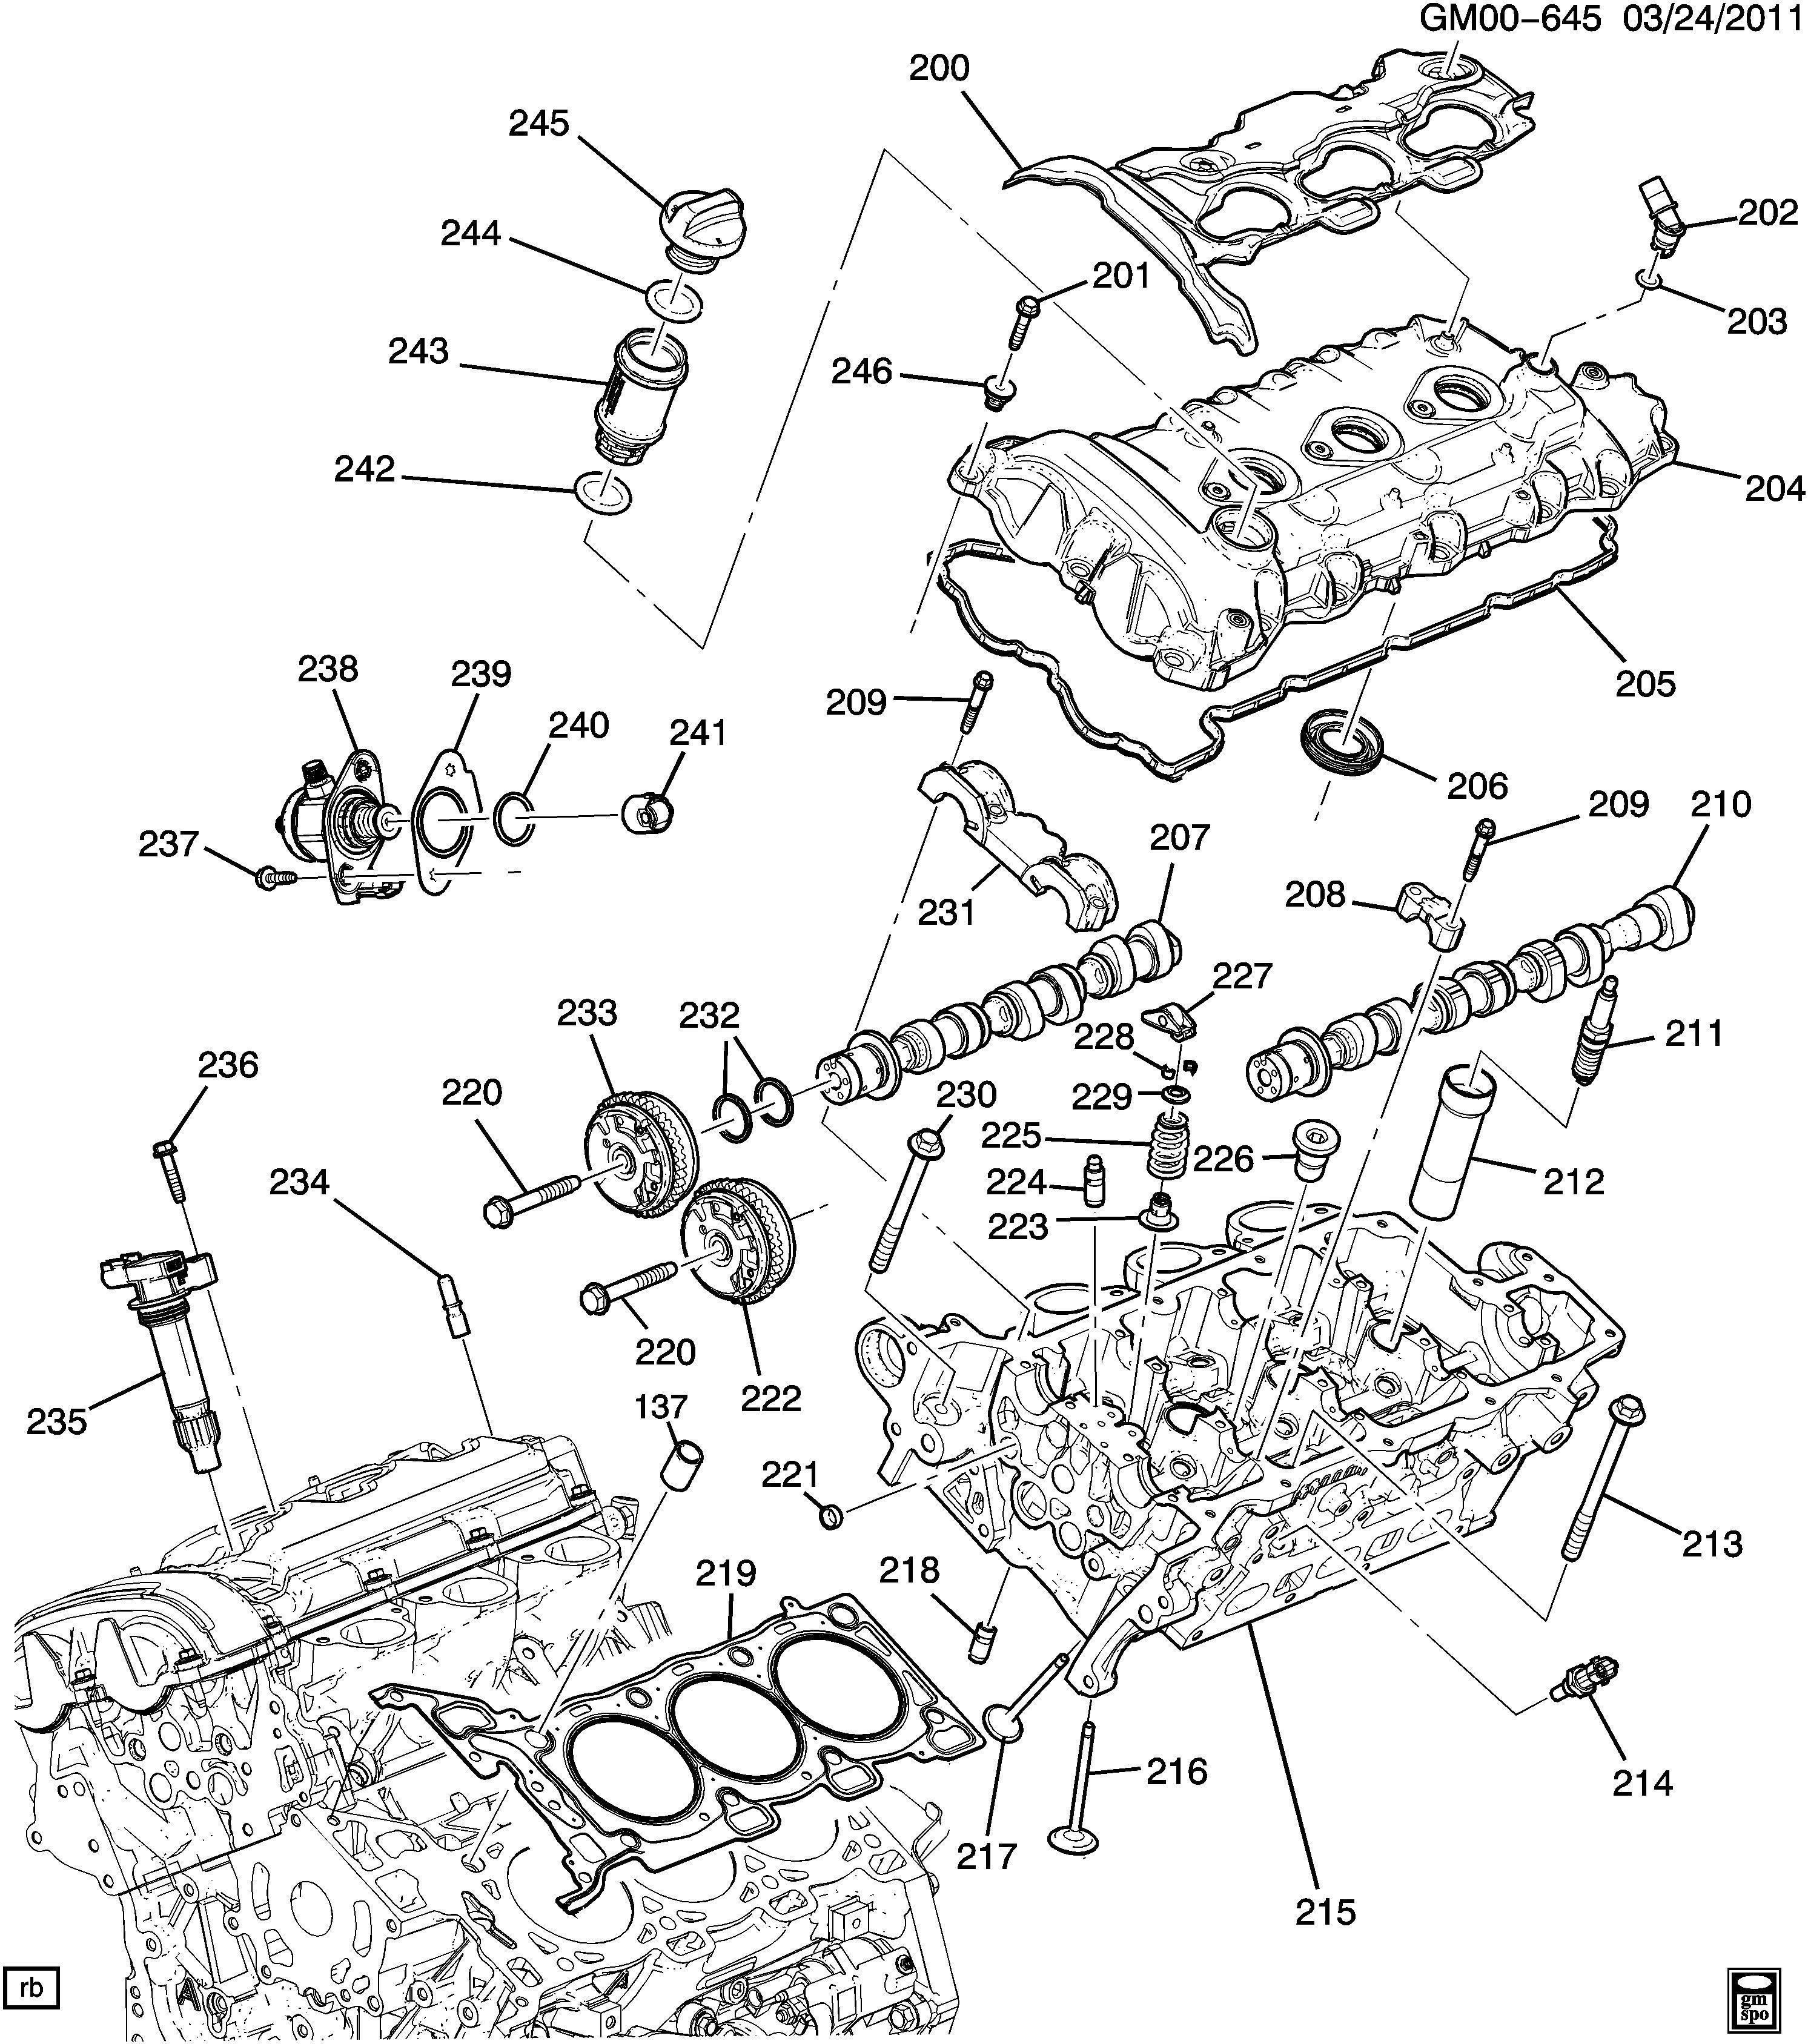 [DIAGRAM_1CA]  RW_8993] 2011 Chevrolet Traverse Engine Diagram | 2009 Traverse Engine Diagram |  | Sapebe Barep Mohammedshrine Librar Wiring 101